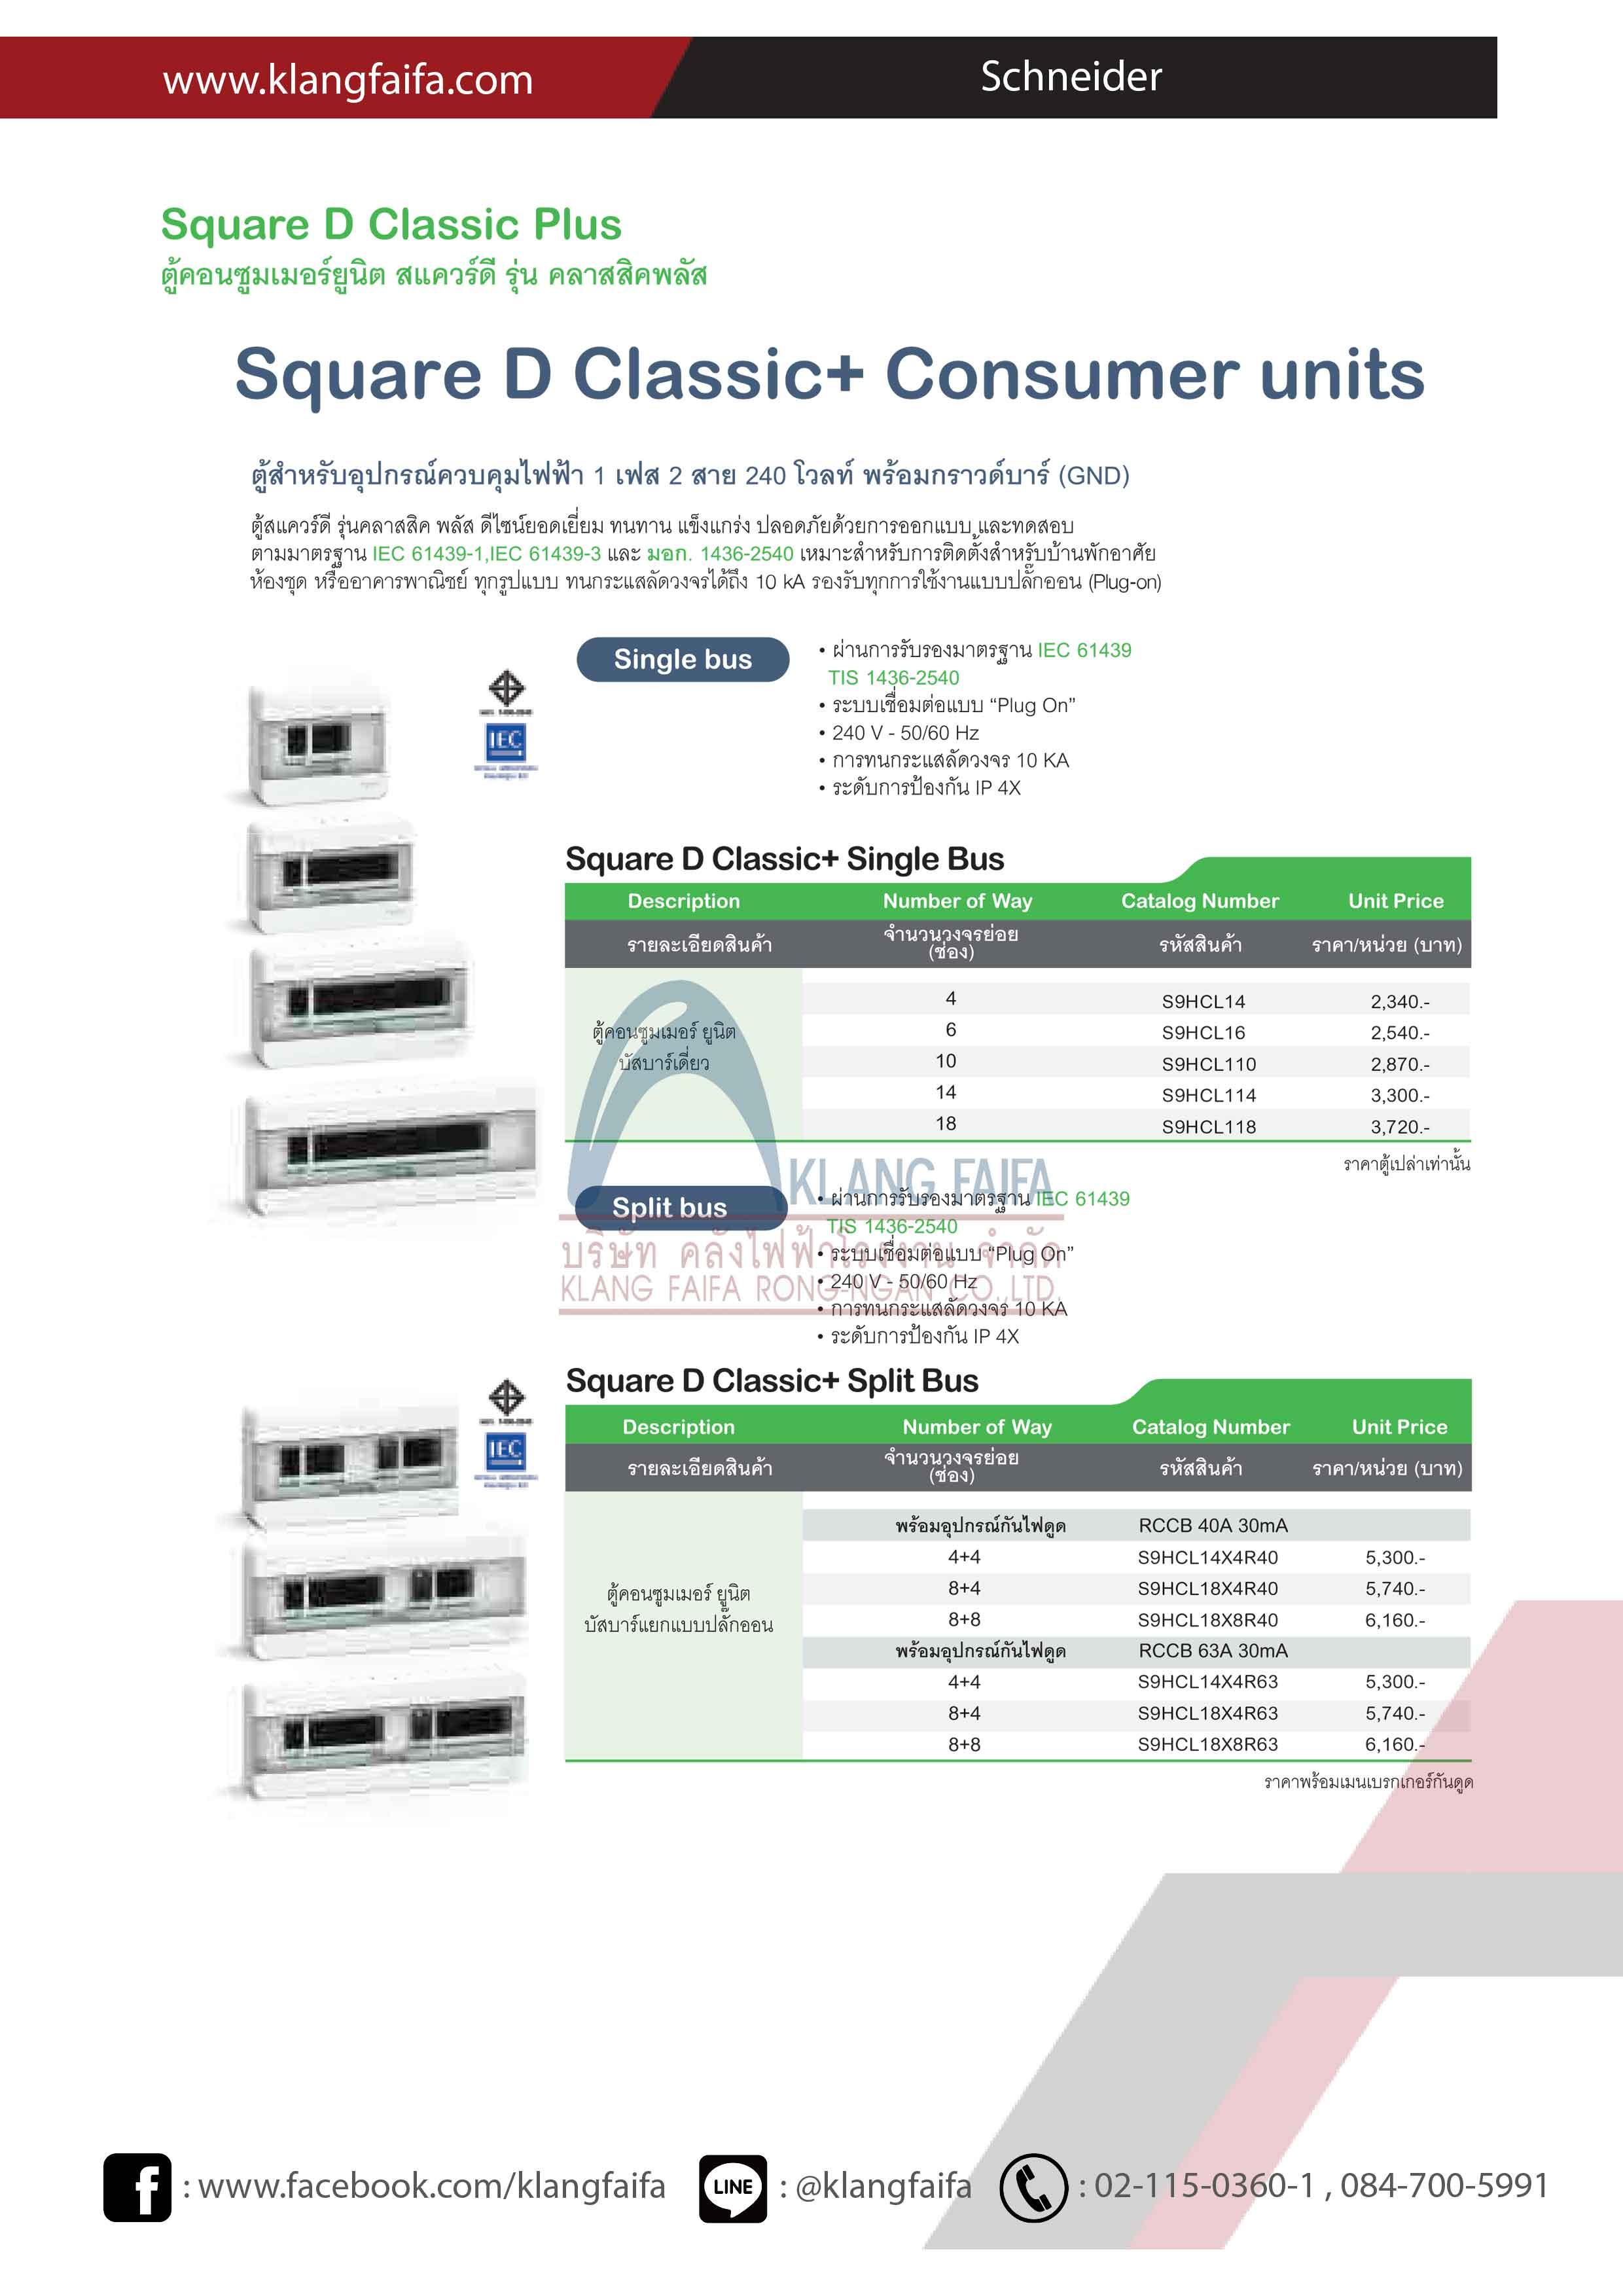 Schneider,-ชไนเดอร์, Schneider2019, Square-D-Classic-Plus, ตู้คอนซูเมอร์ยูนิต, สแควร์ดี-รุ่น-คลาสสิคพลัส